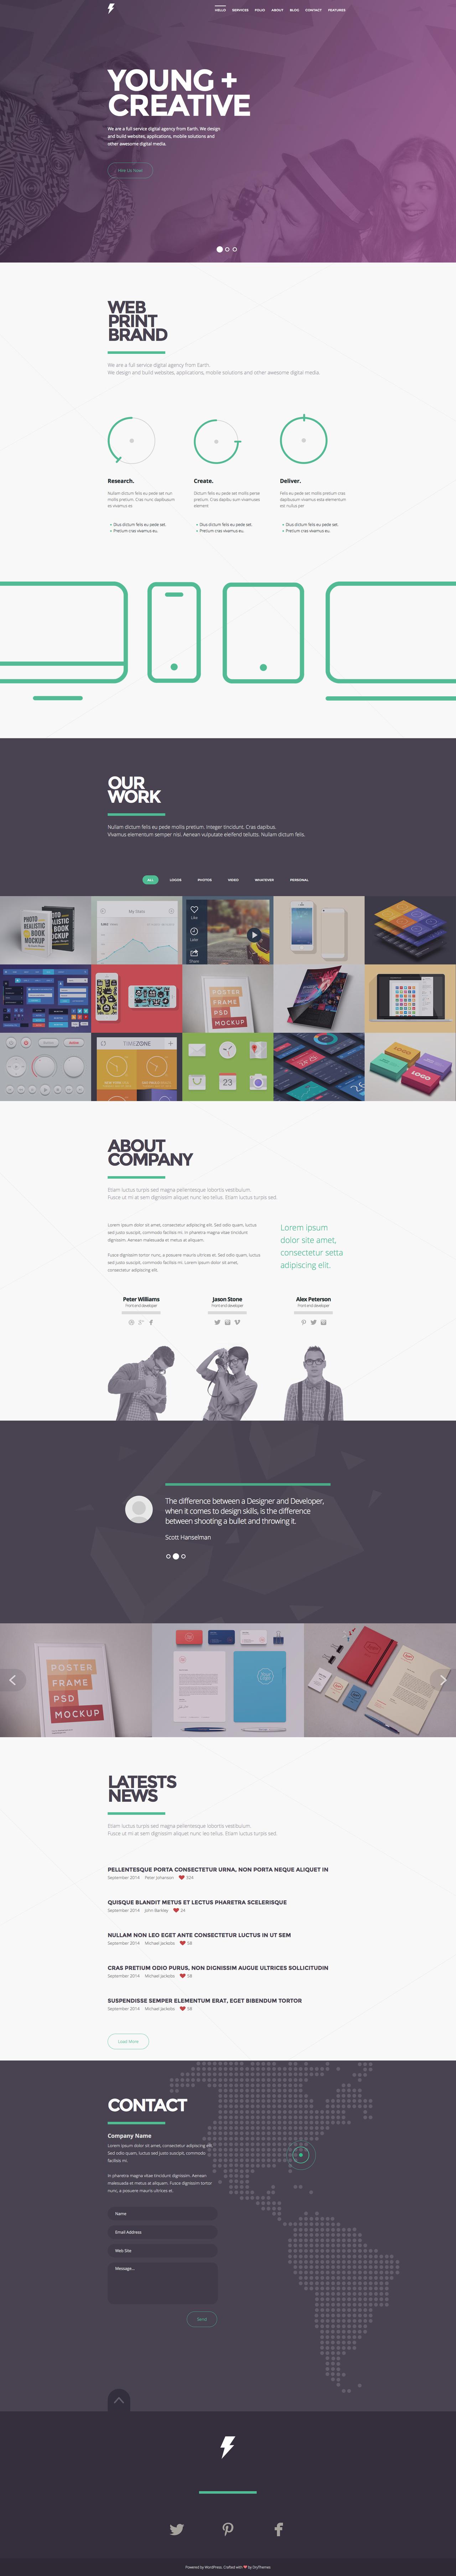 Sensa - One Page Wordpress Theme by sandracz